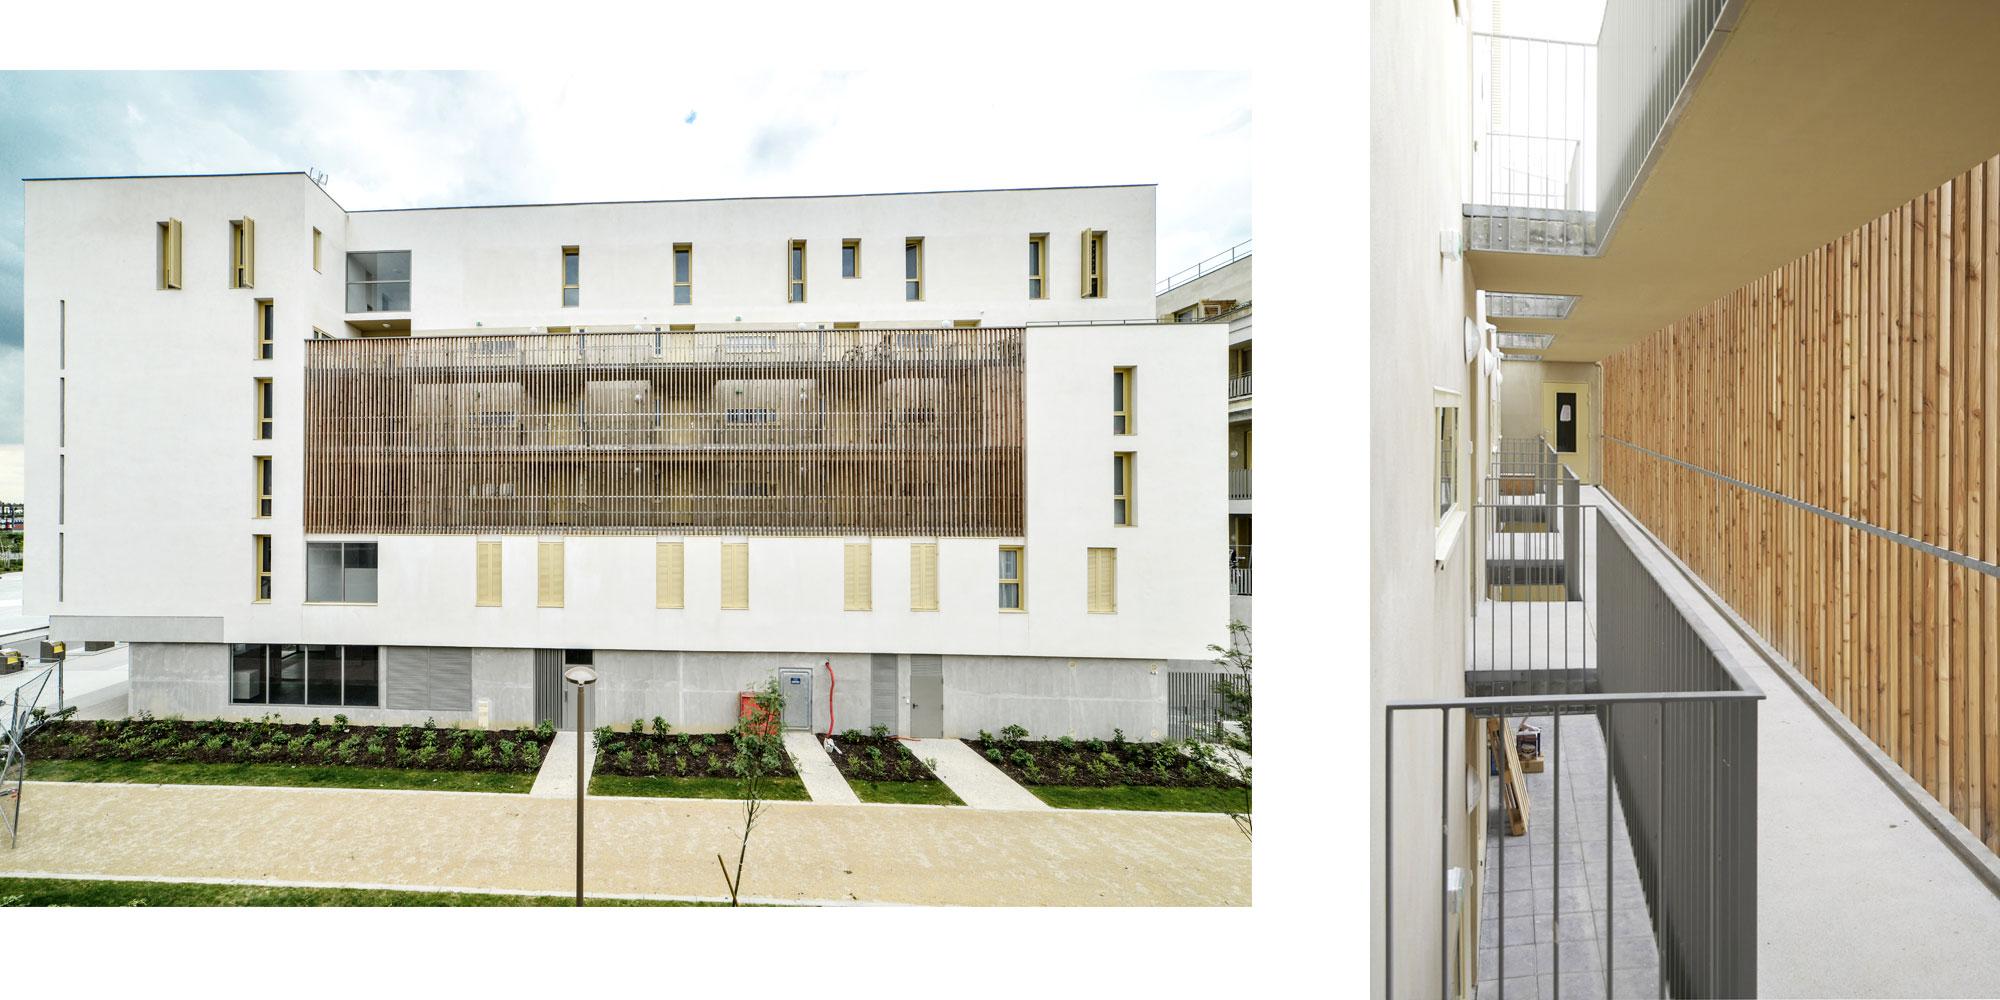 11-jam-SO2-bretigny-logements-facade-nord-est-et-coursive